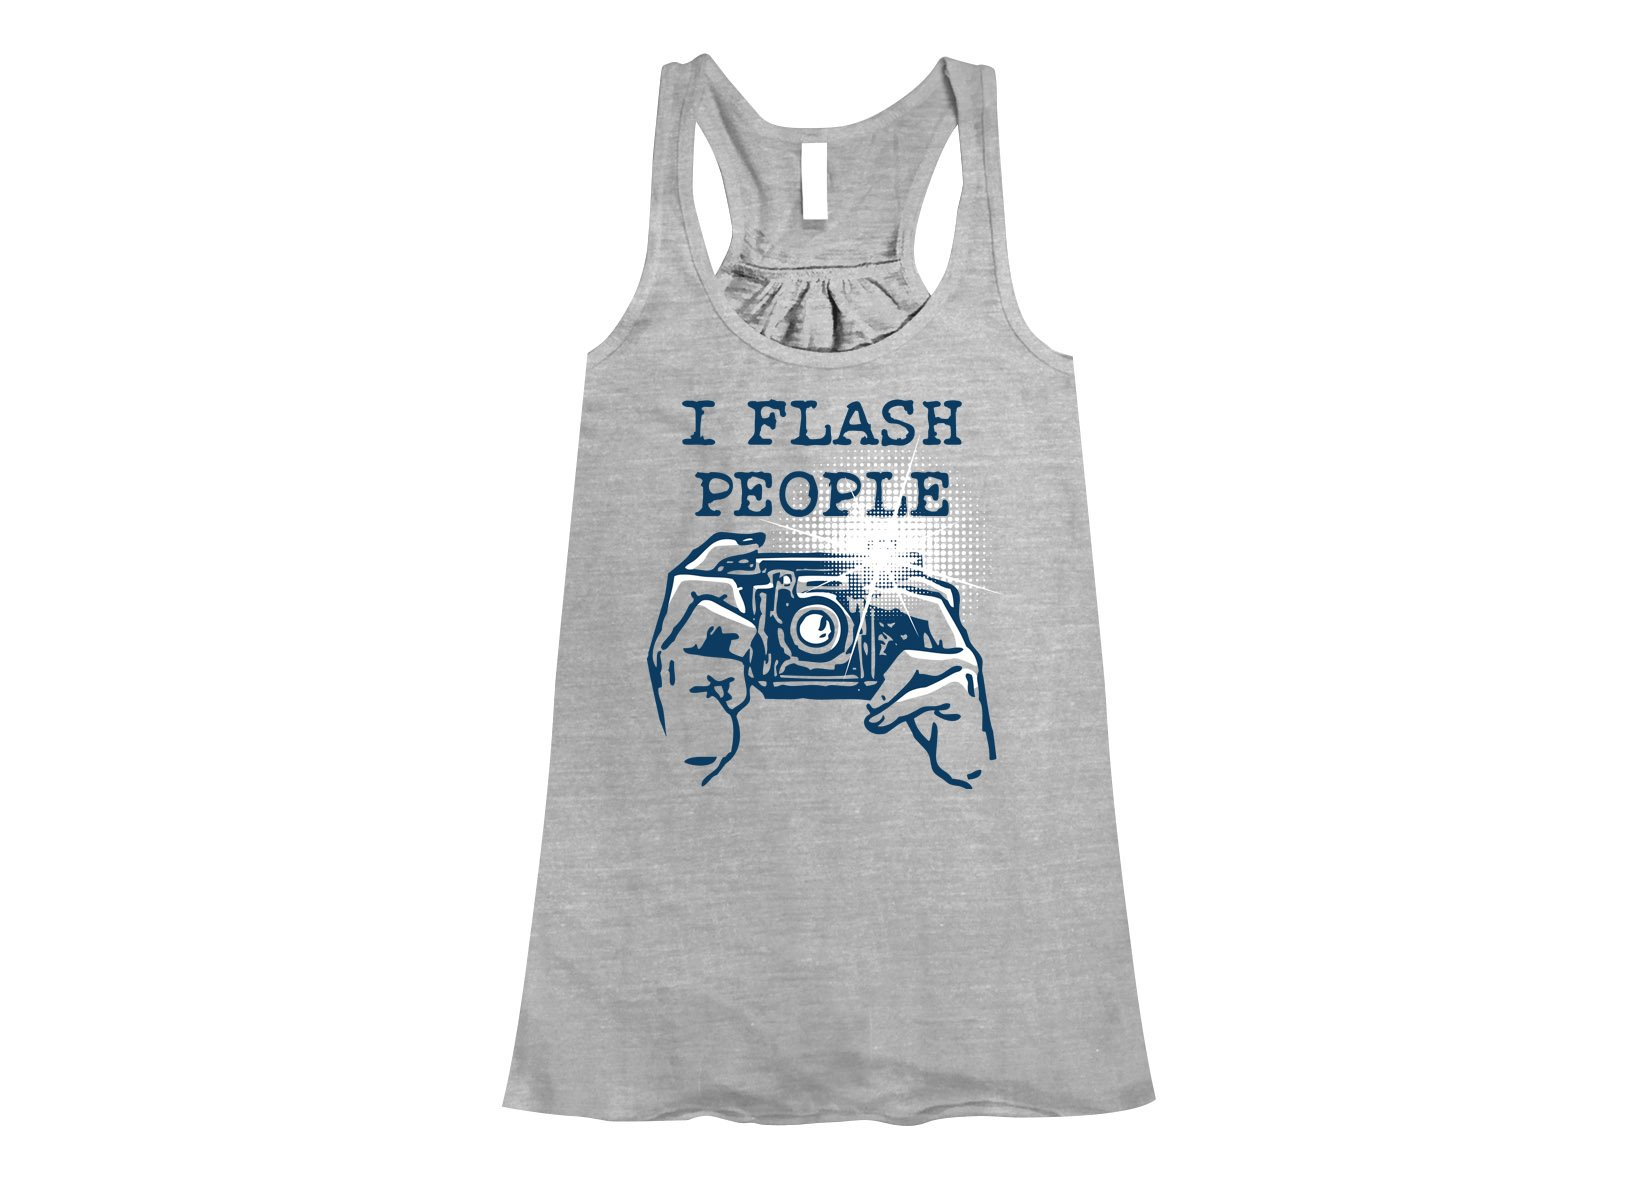 I Flash People on Womens Tanks T-Shirt